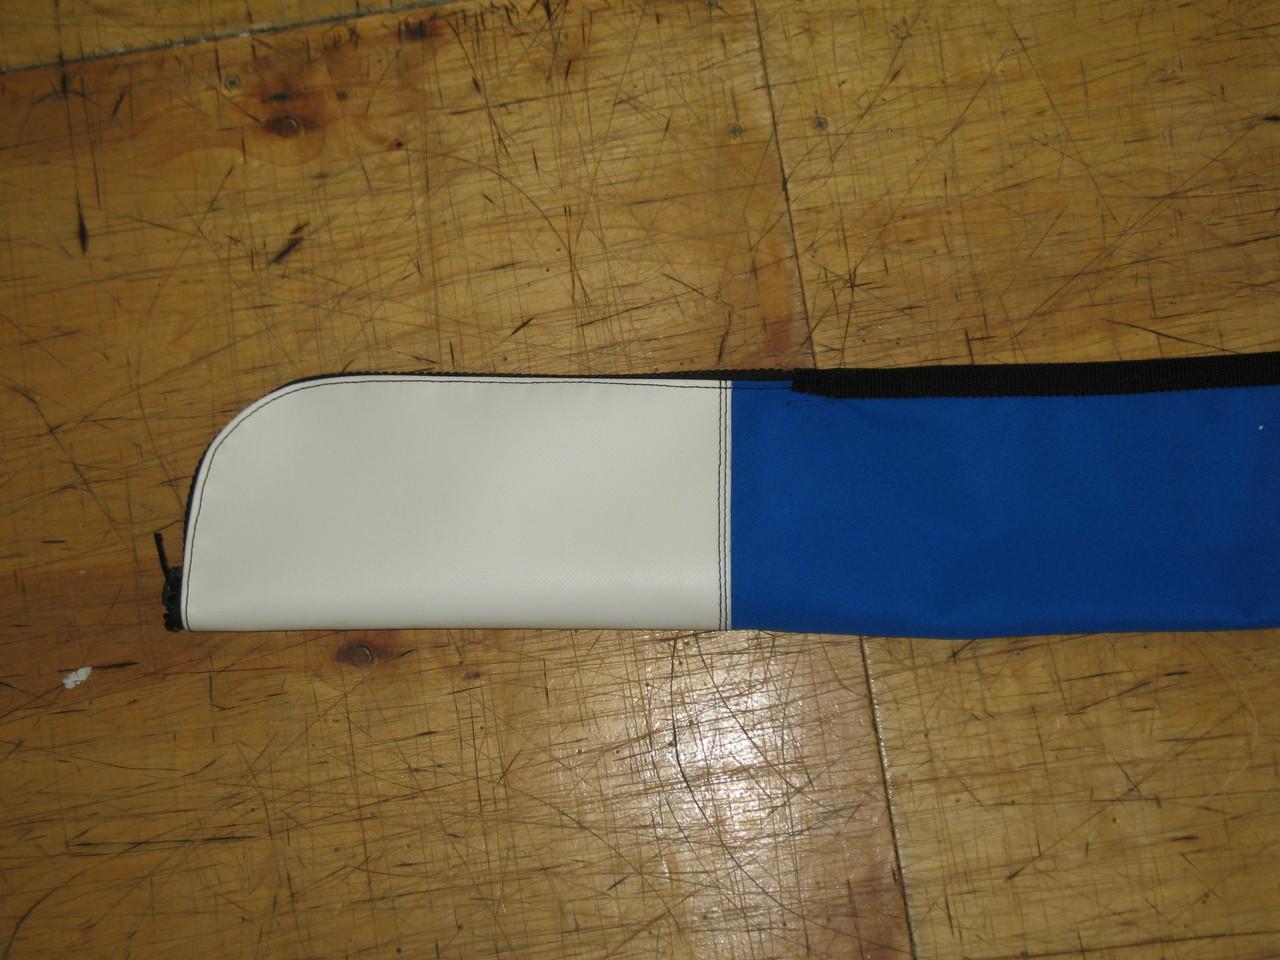 Vinyl reinforcement at mast base to prevent premature wear.